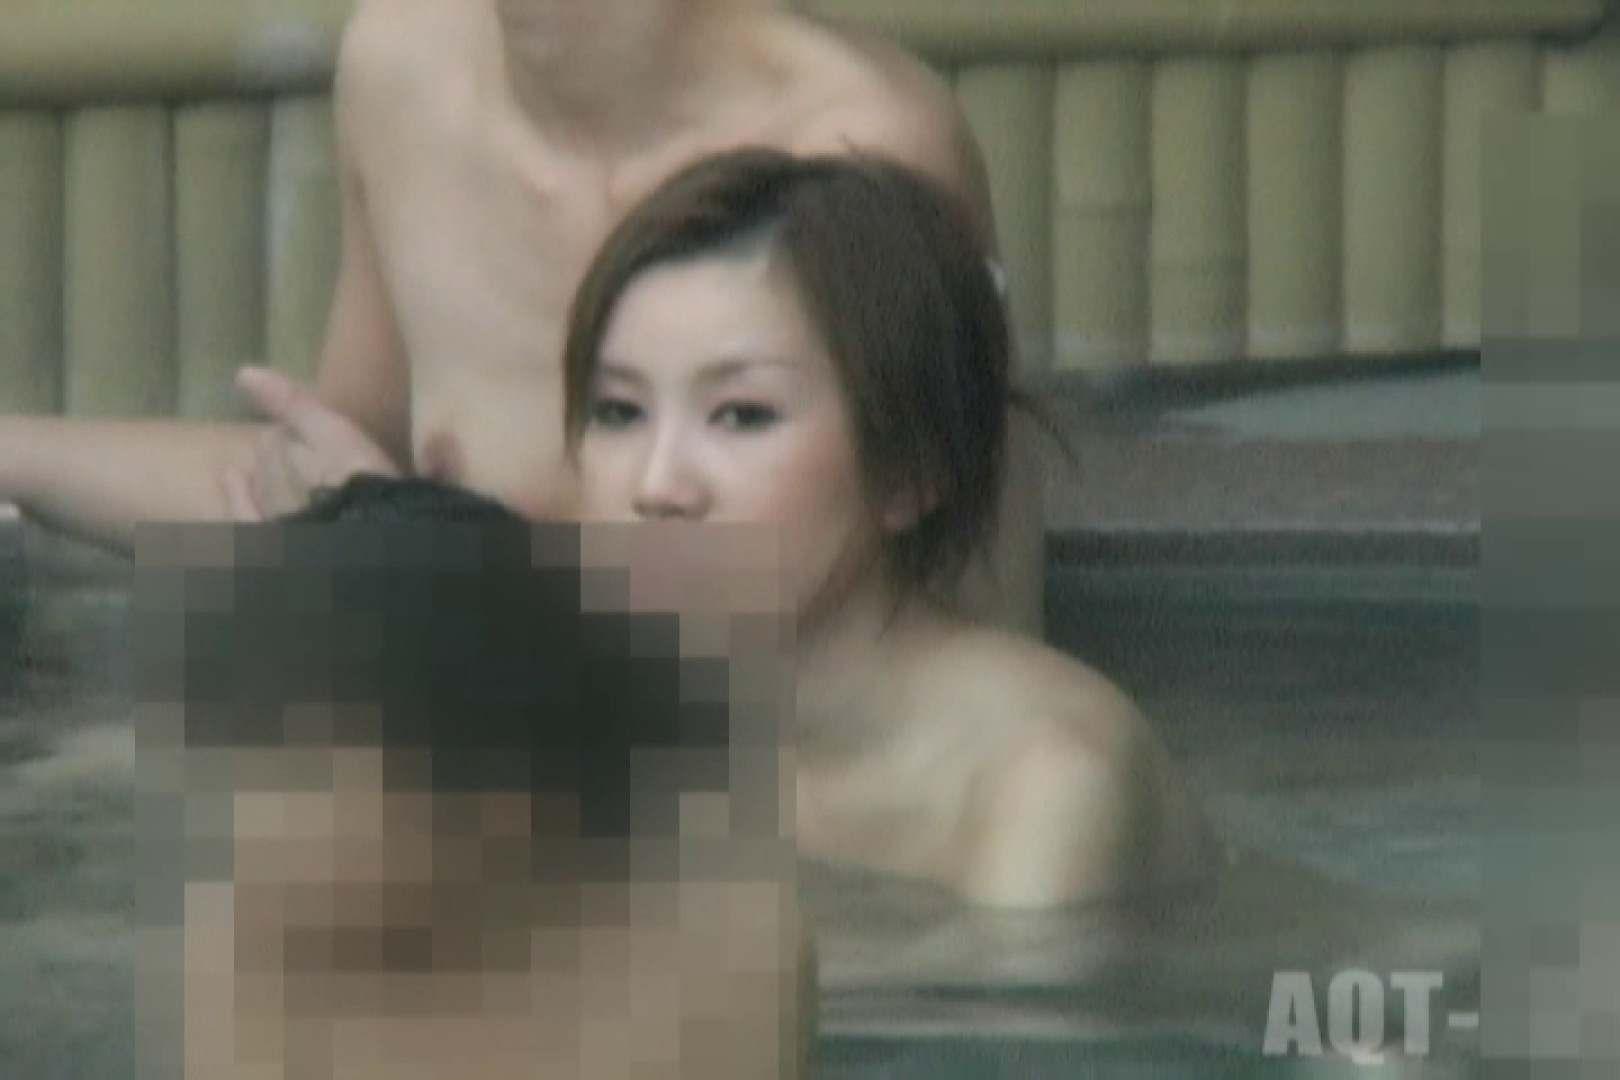 Aquaな露天風呂Vol.857 0   0  91連発 35